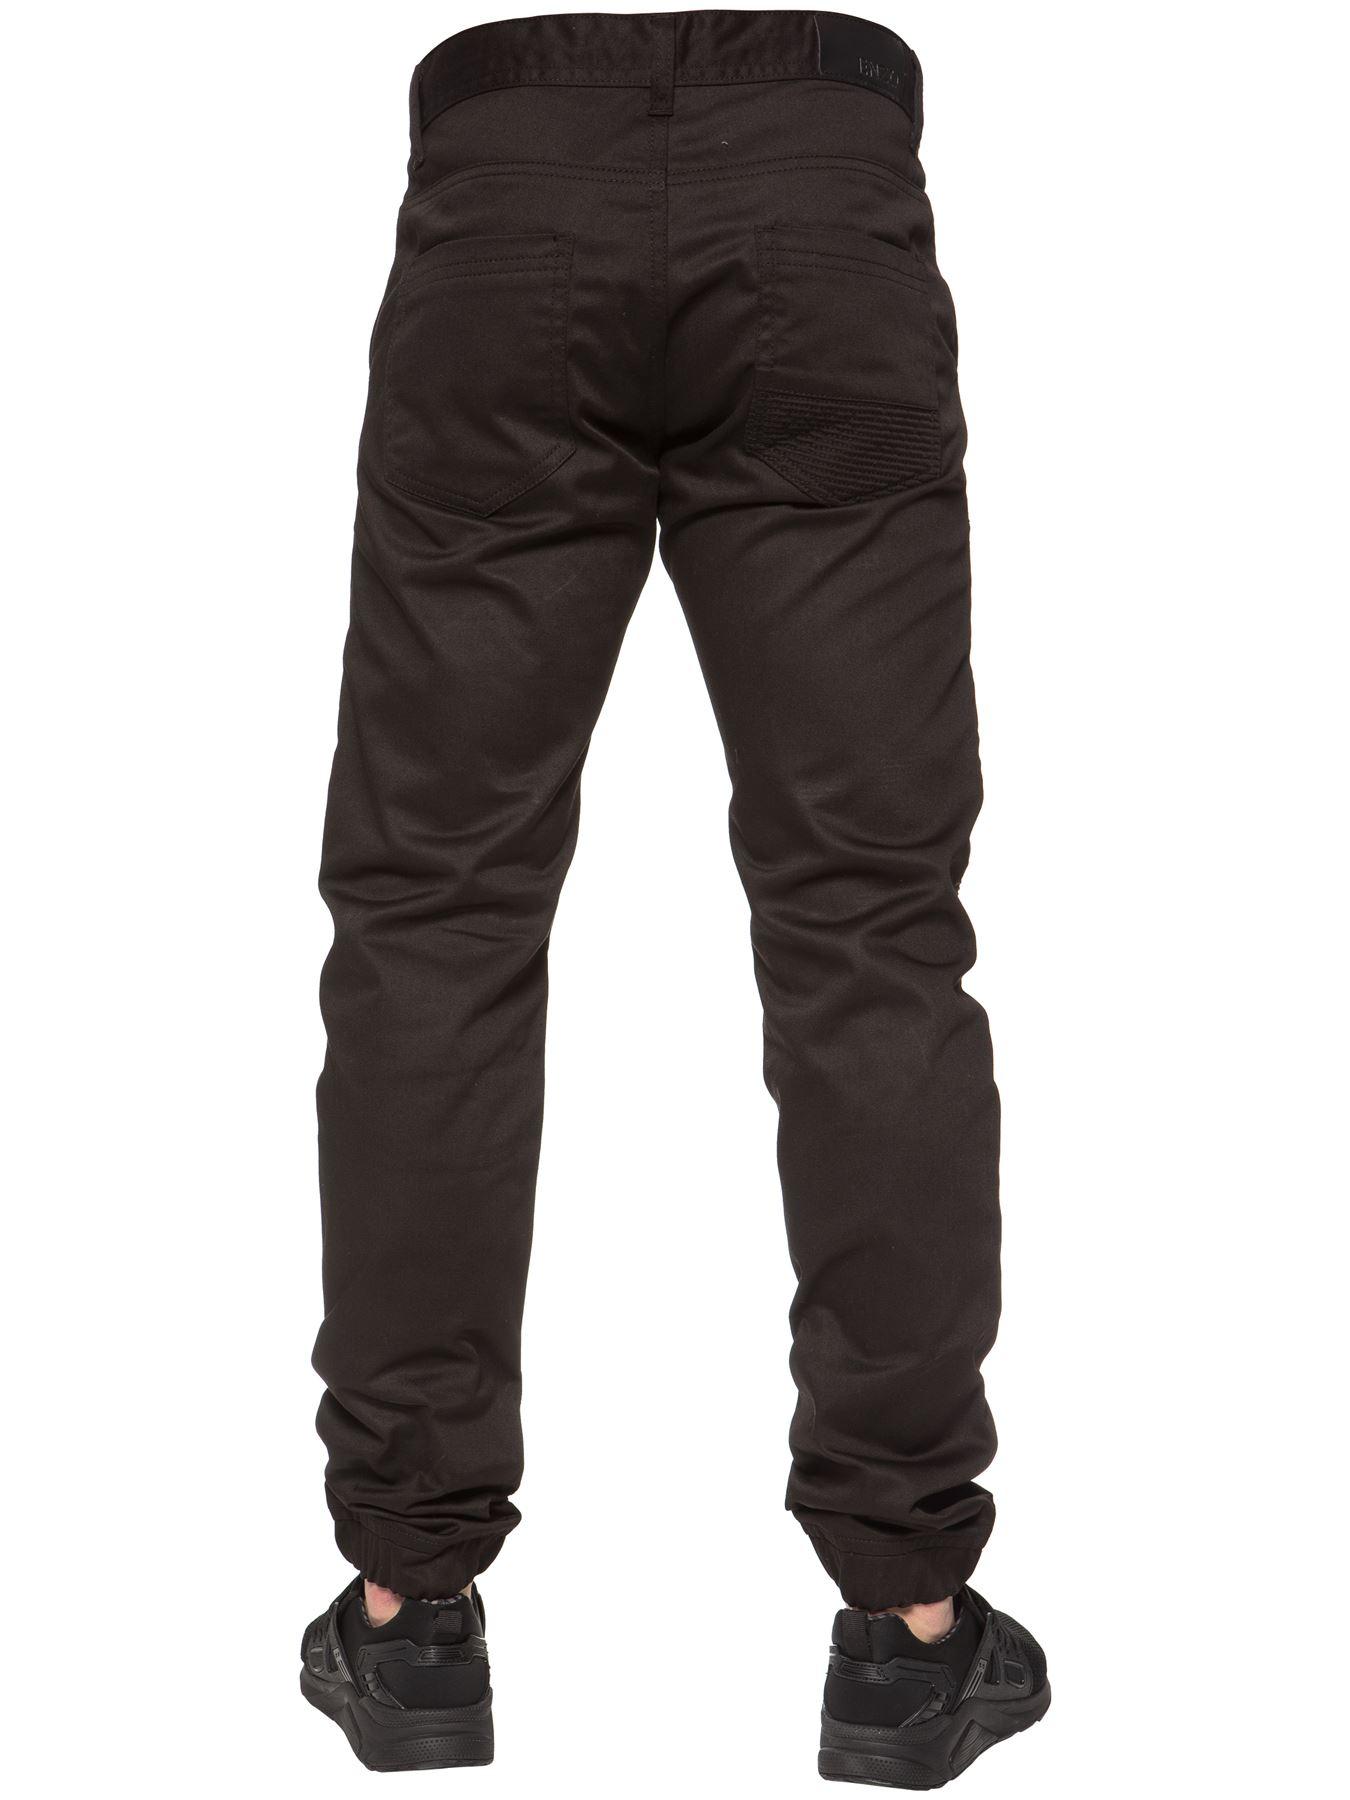 Enzo-Designer-Mens-Cuffed-Chinos-Biker-Jeans-Slim-Denim-Trousers-Pants-Joggers thumbnail 4